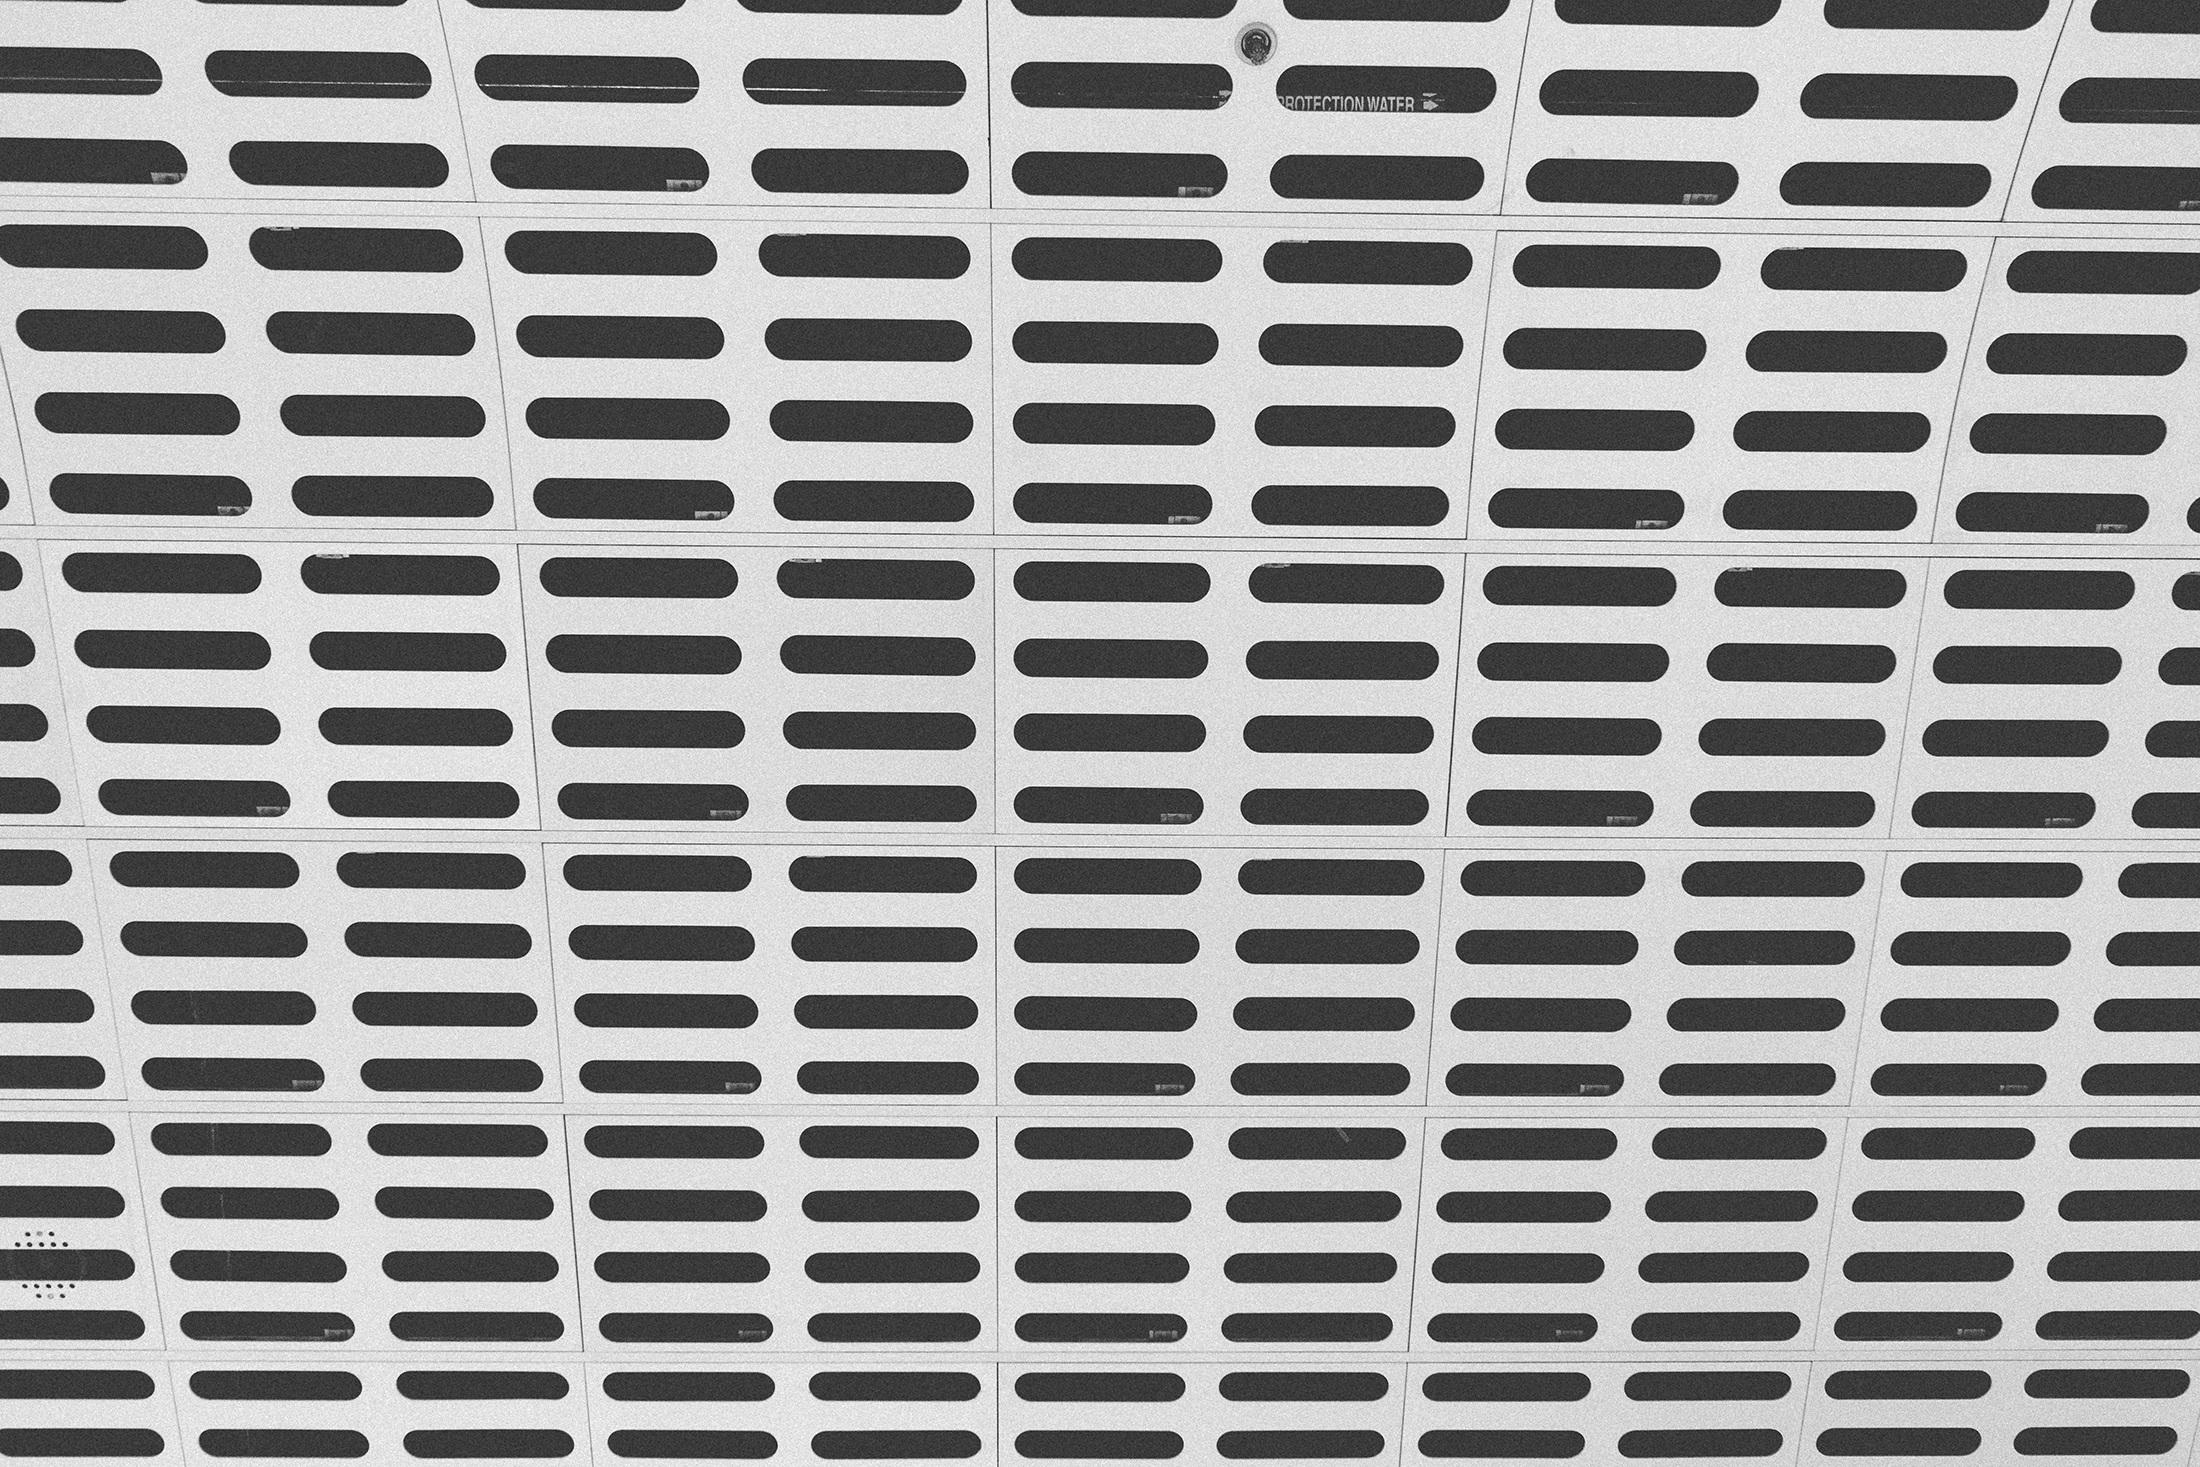 Free Images texture floor ceiling pattern line metal